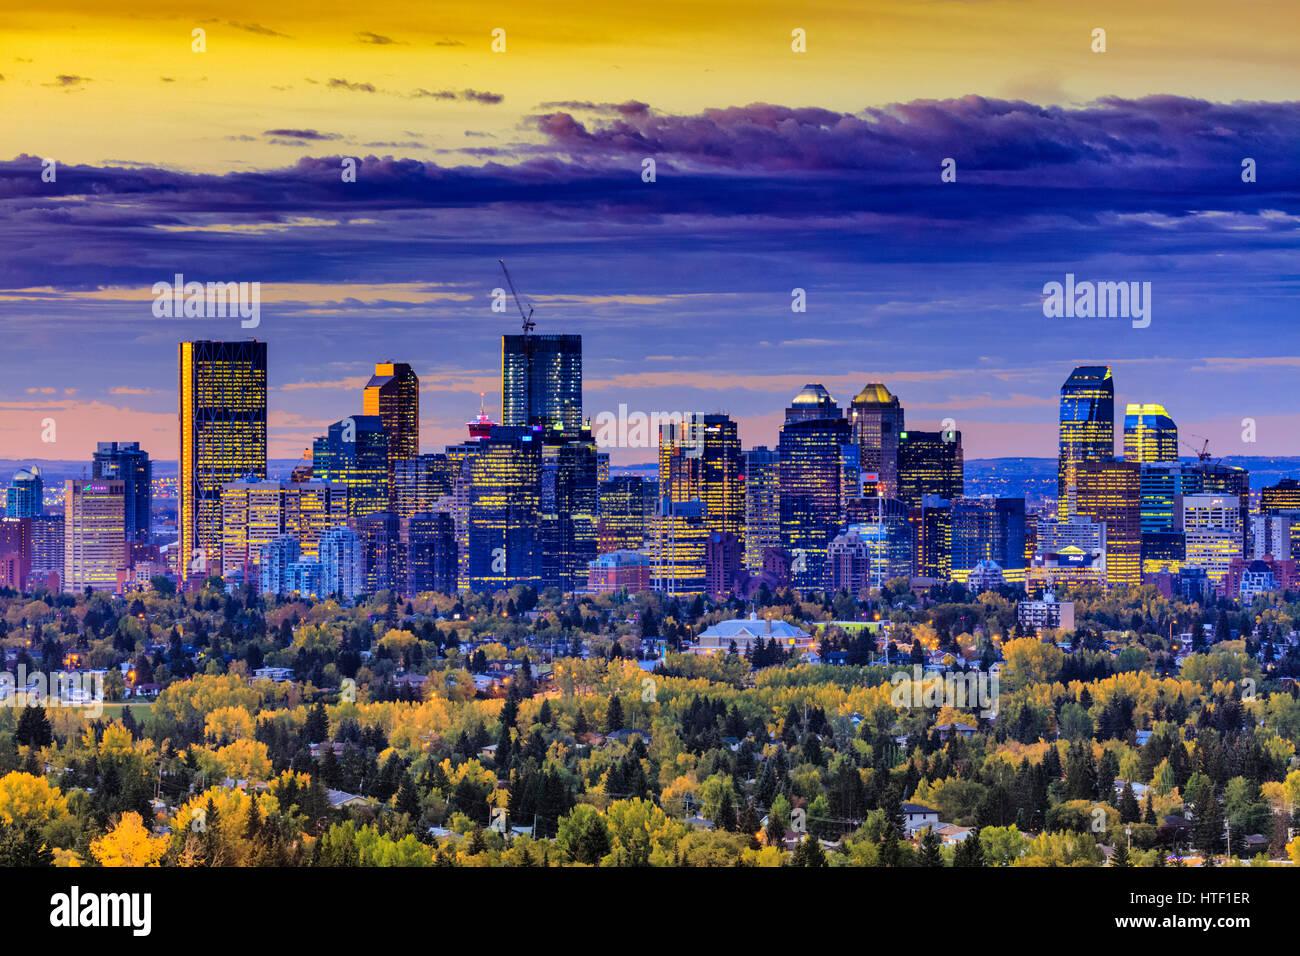 Downtown Calgary skyline di sunrise, Alberta Immagini Stock